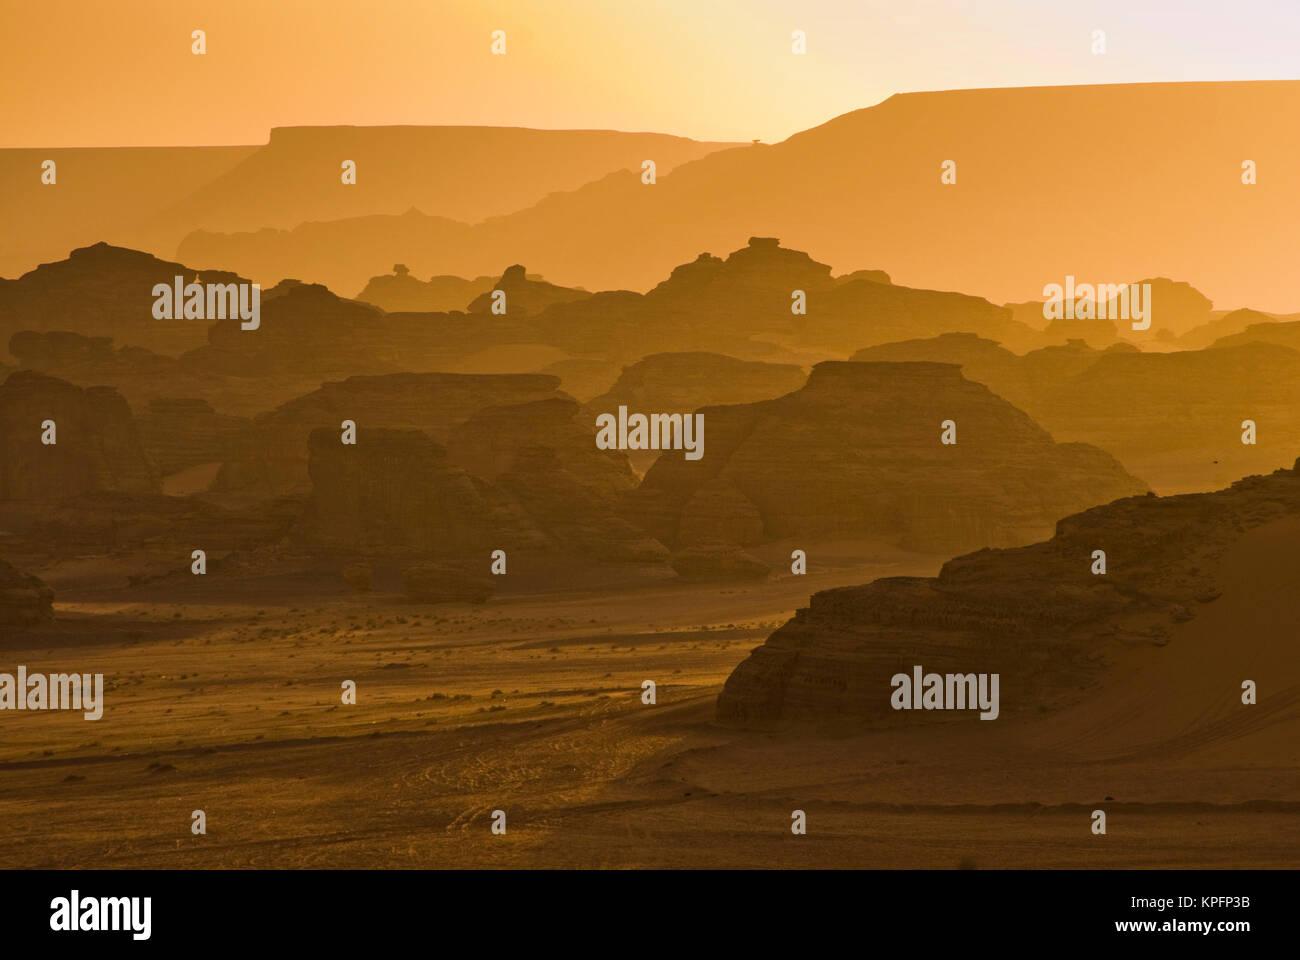 Saudi Arabia, Al Ula, desert near the oasis - Stock Image